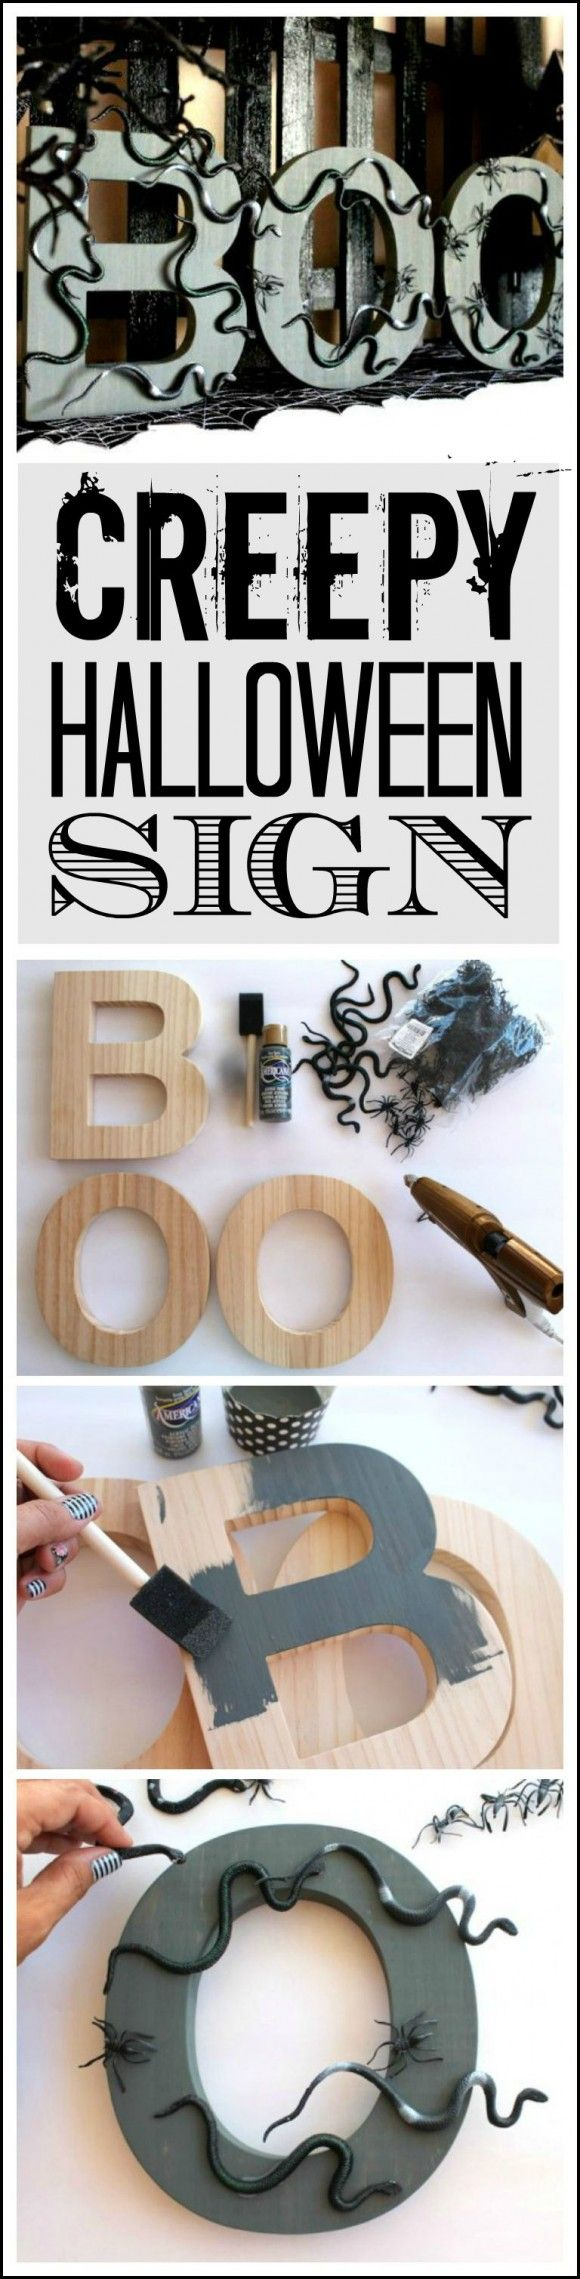 Creepy Halloween BOO Sign DIY   CatchMyParty.com